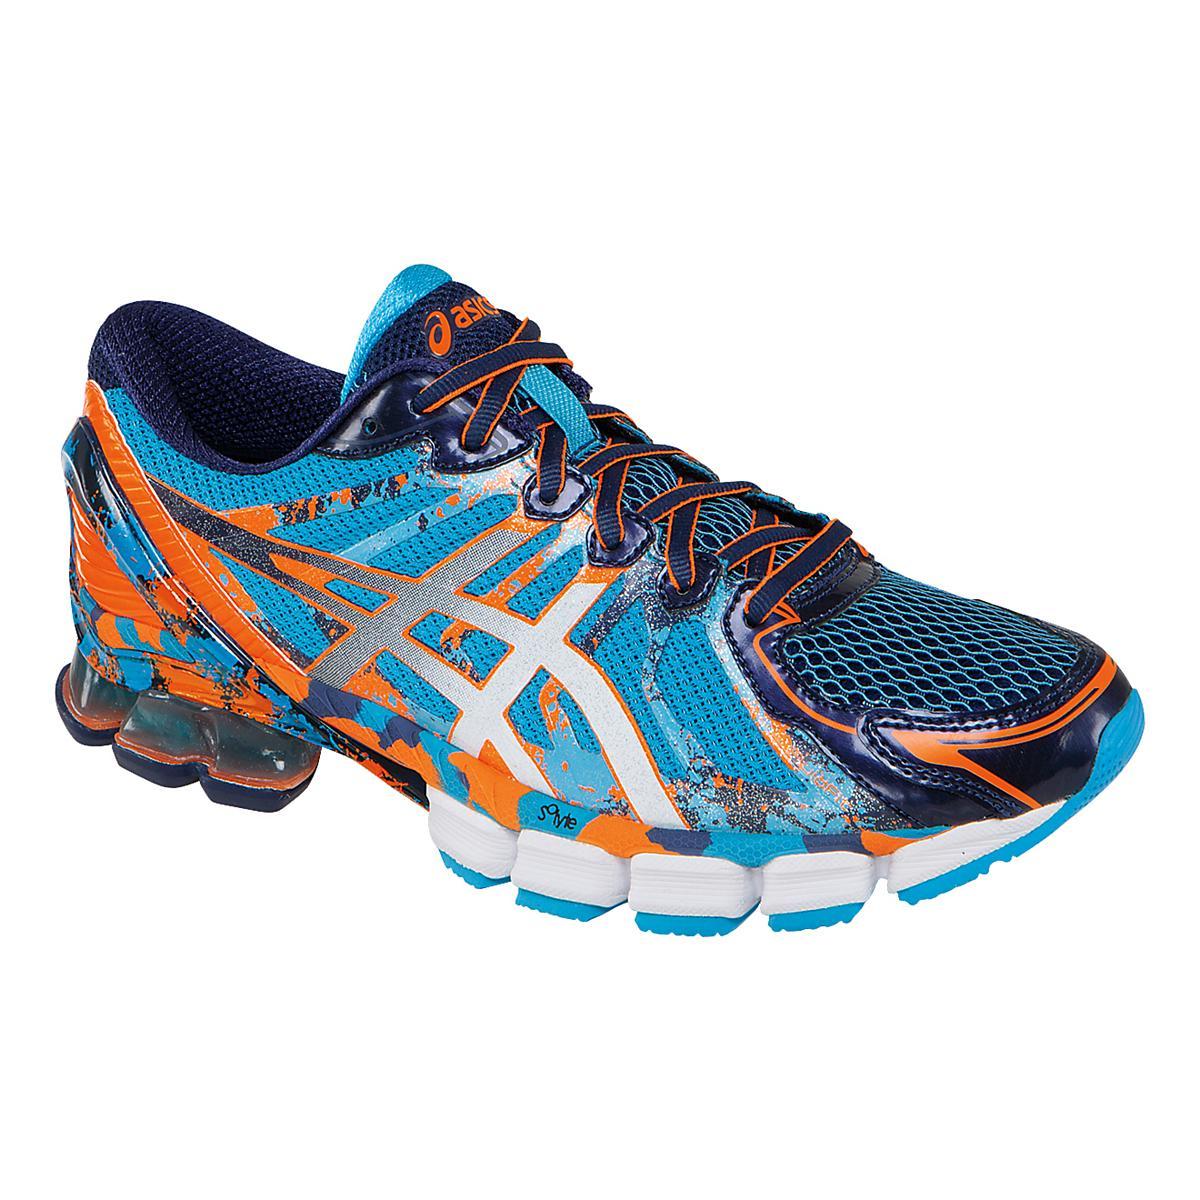 huge discount 87aaa d502f ... mens asics gel sendai 2 running shoe at road runner sports .